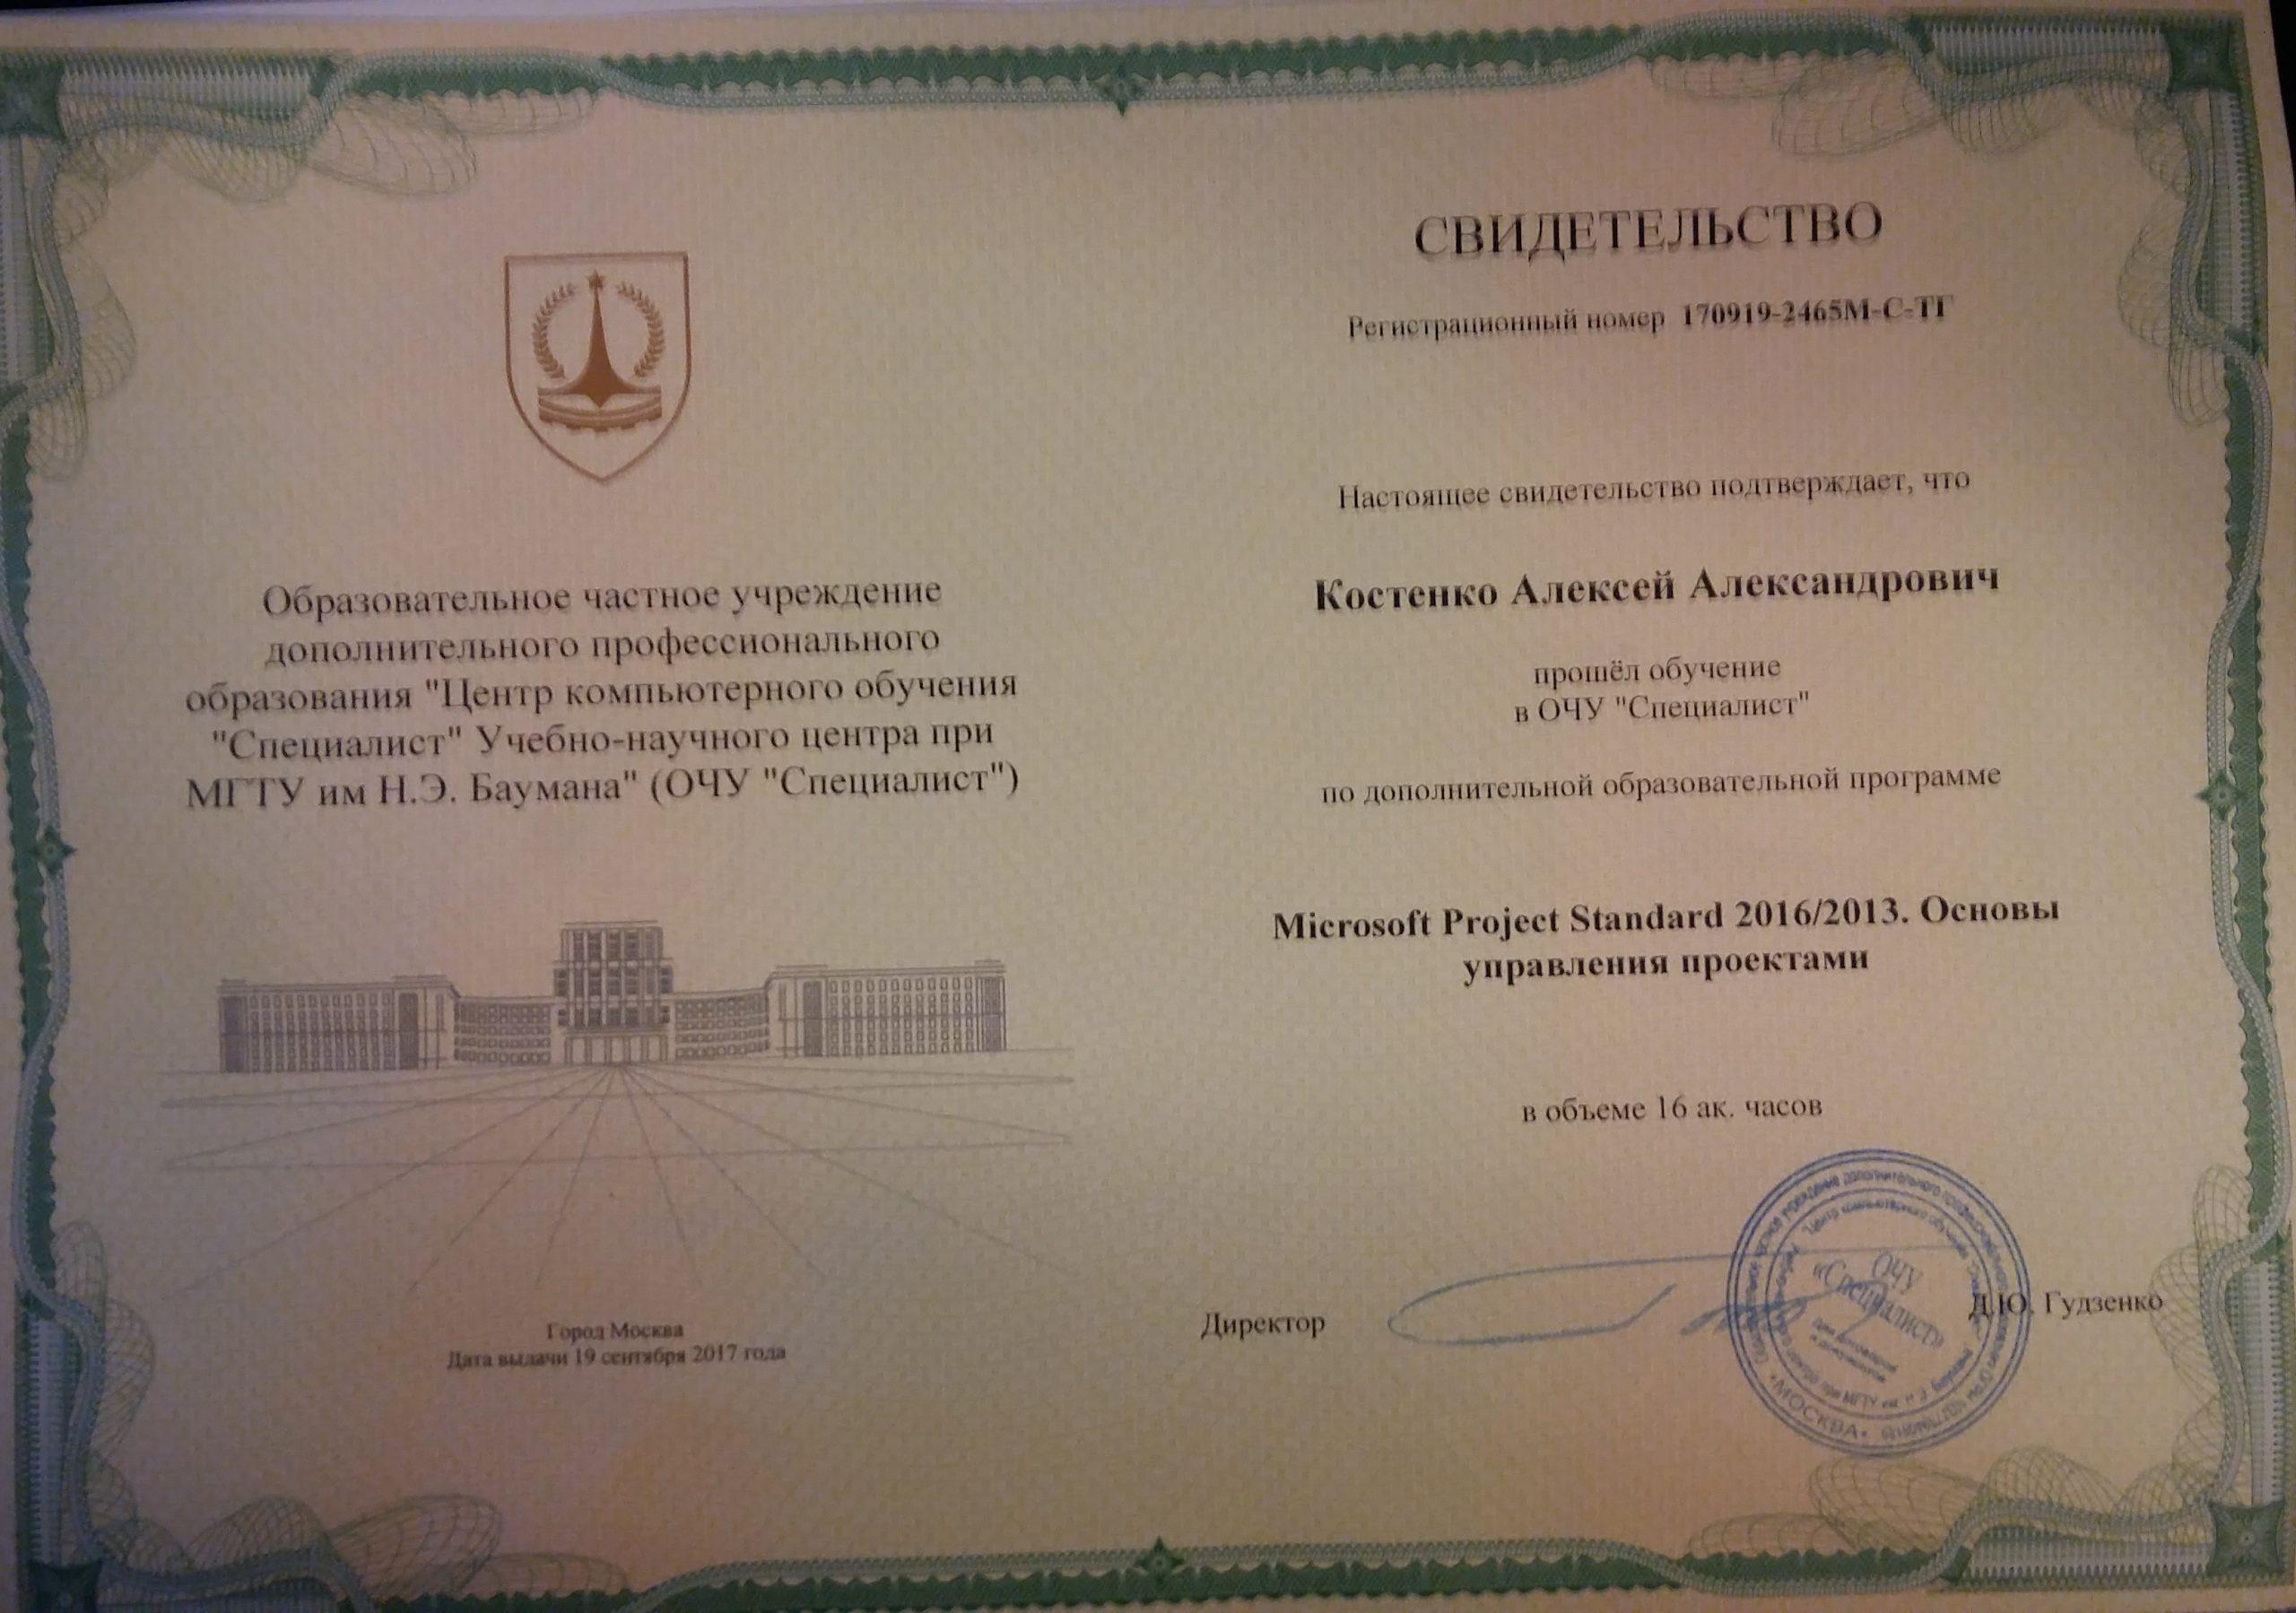 MS Sharepoint 2013/2016 - Алексей Костенко